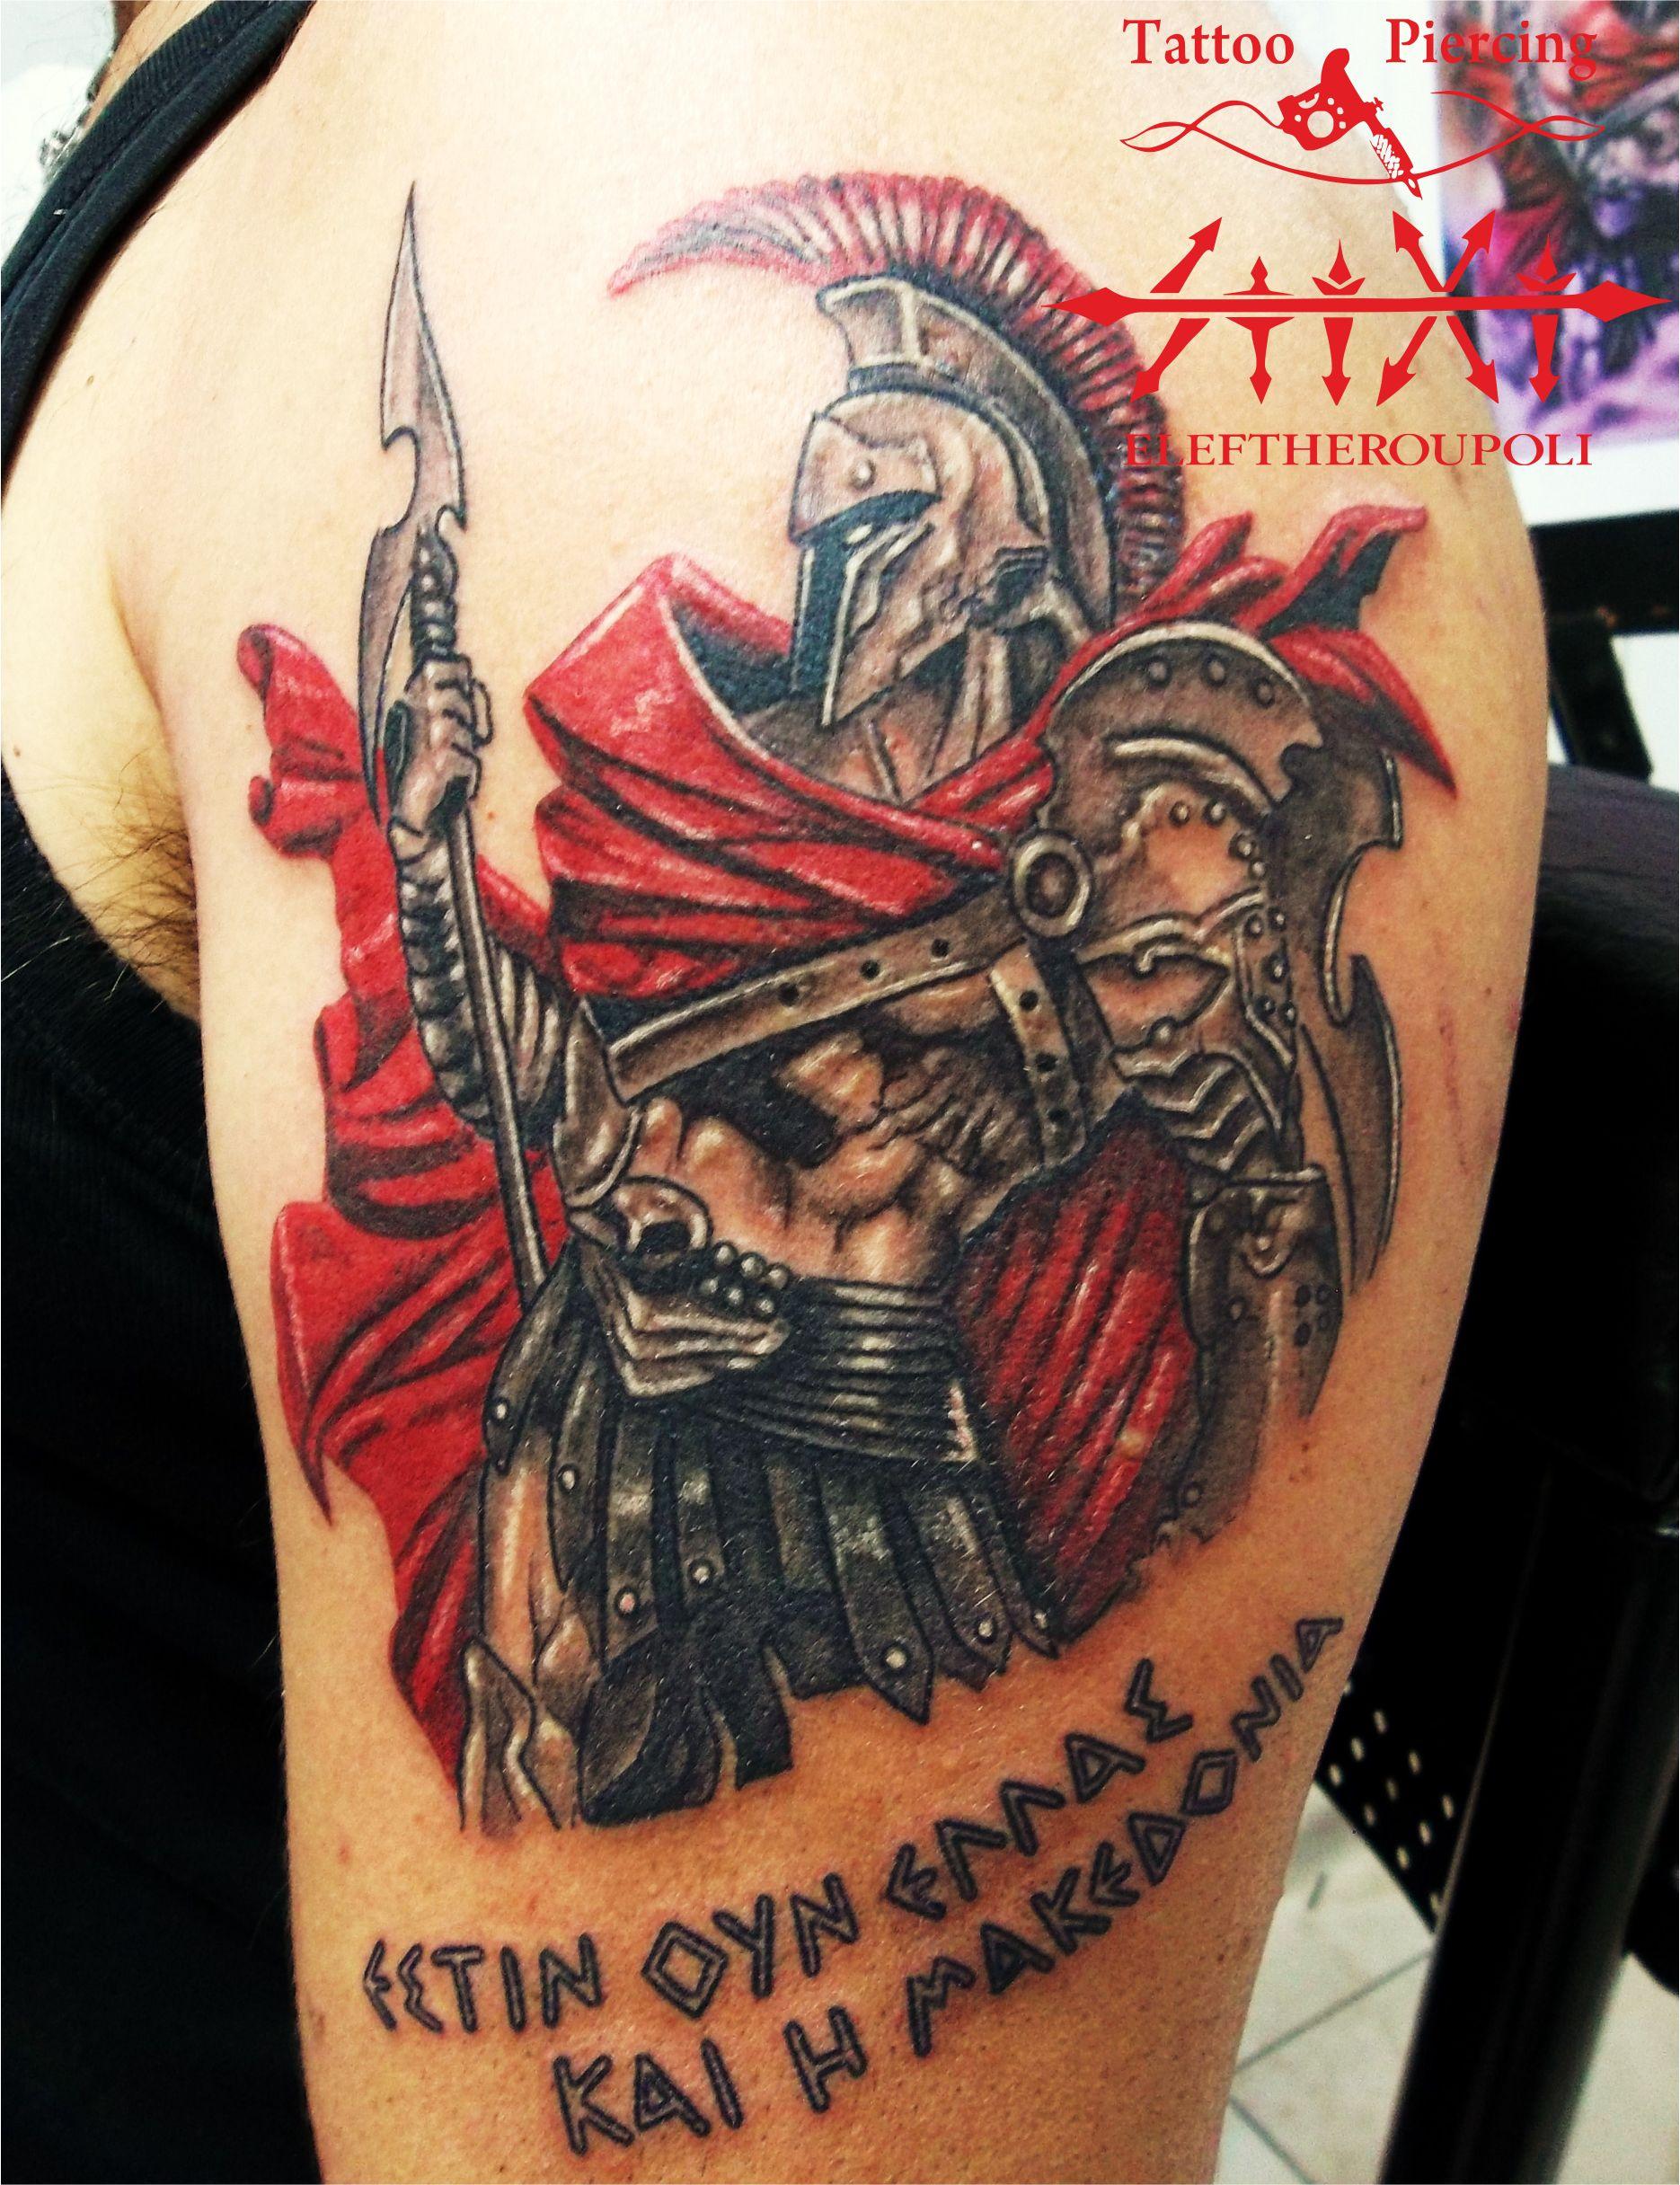 Stixi Tattoo Studio | Heartbeatink Tattoo Magazine - Tattoo Studio Bielefeld